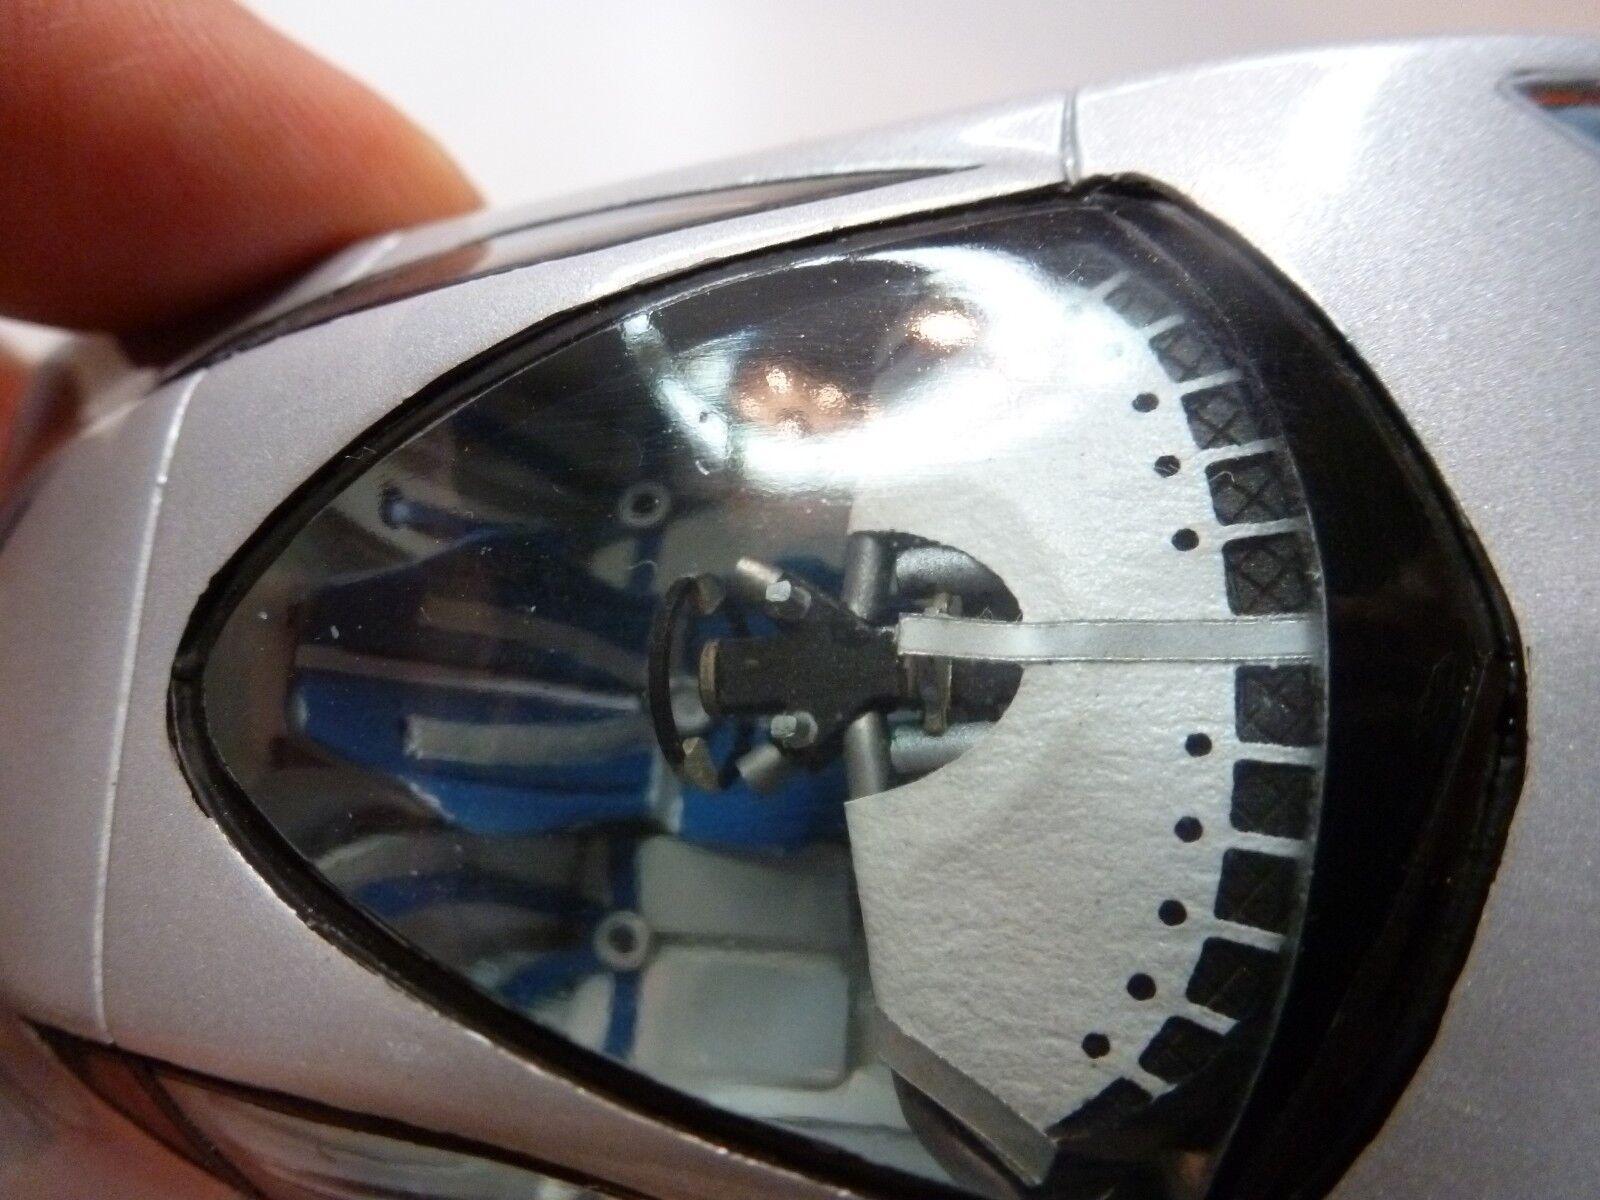 BAN-SENG CITROEN OSEE 2001 - GREY 1 43 43 43 - EXCELLENT - EXTREMELY RARE - 22 13fdc4